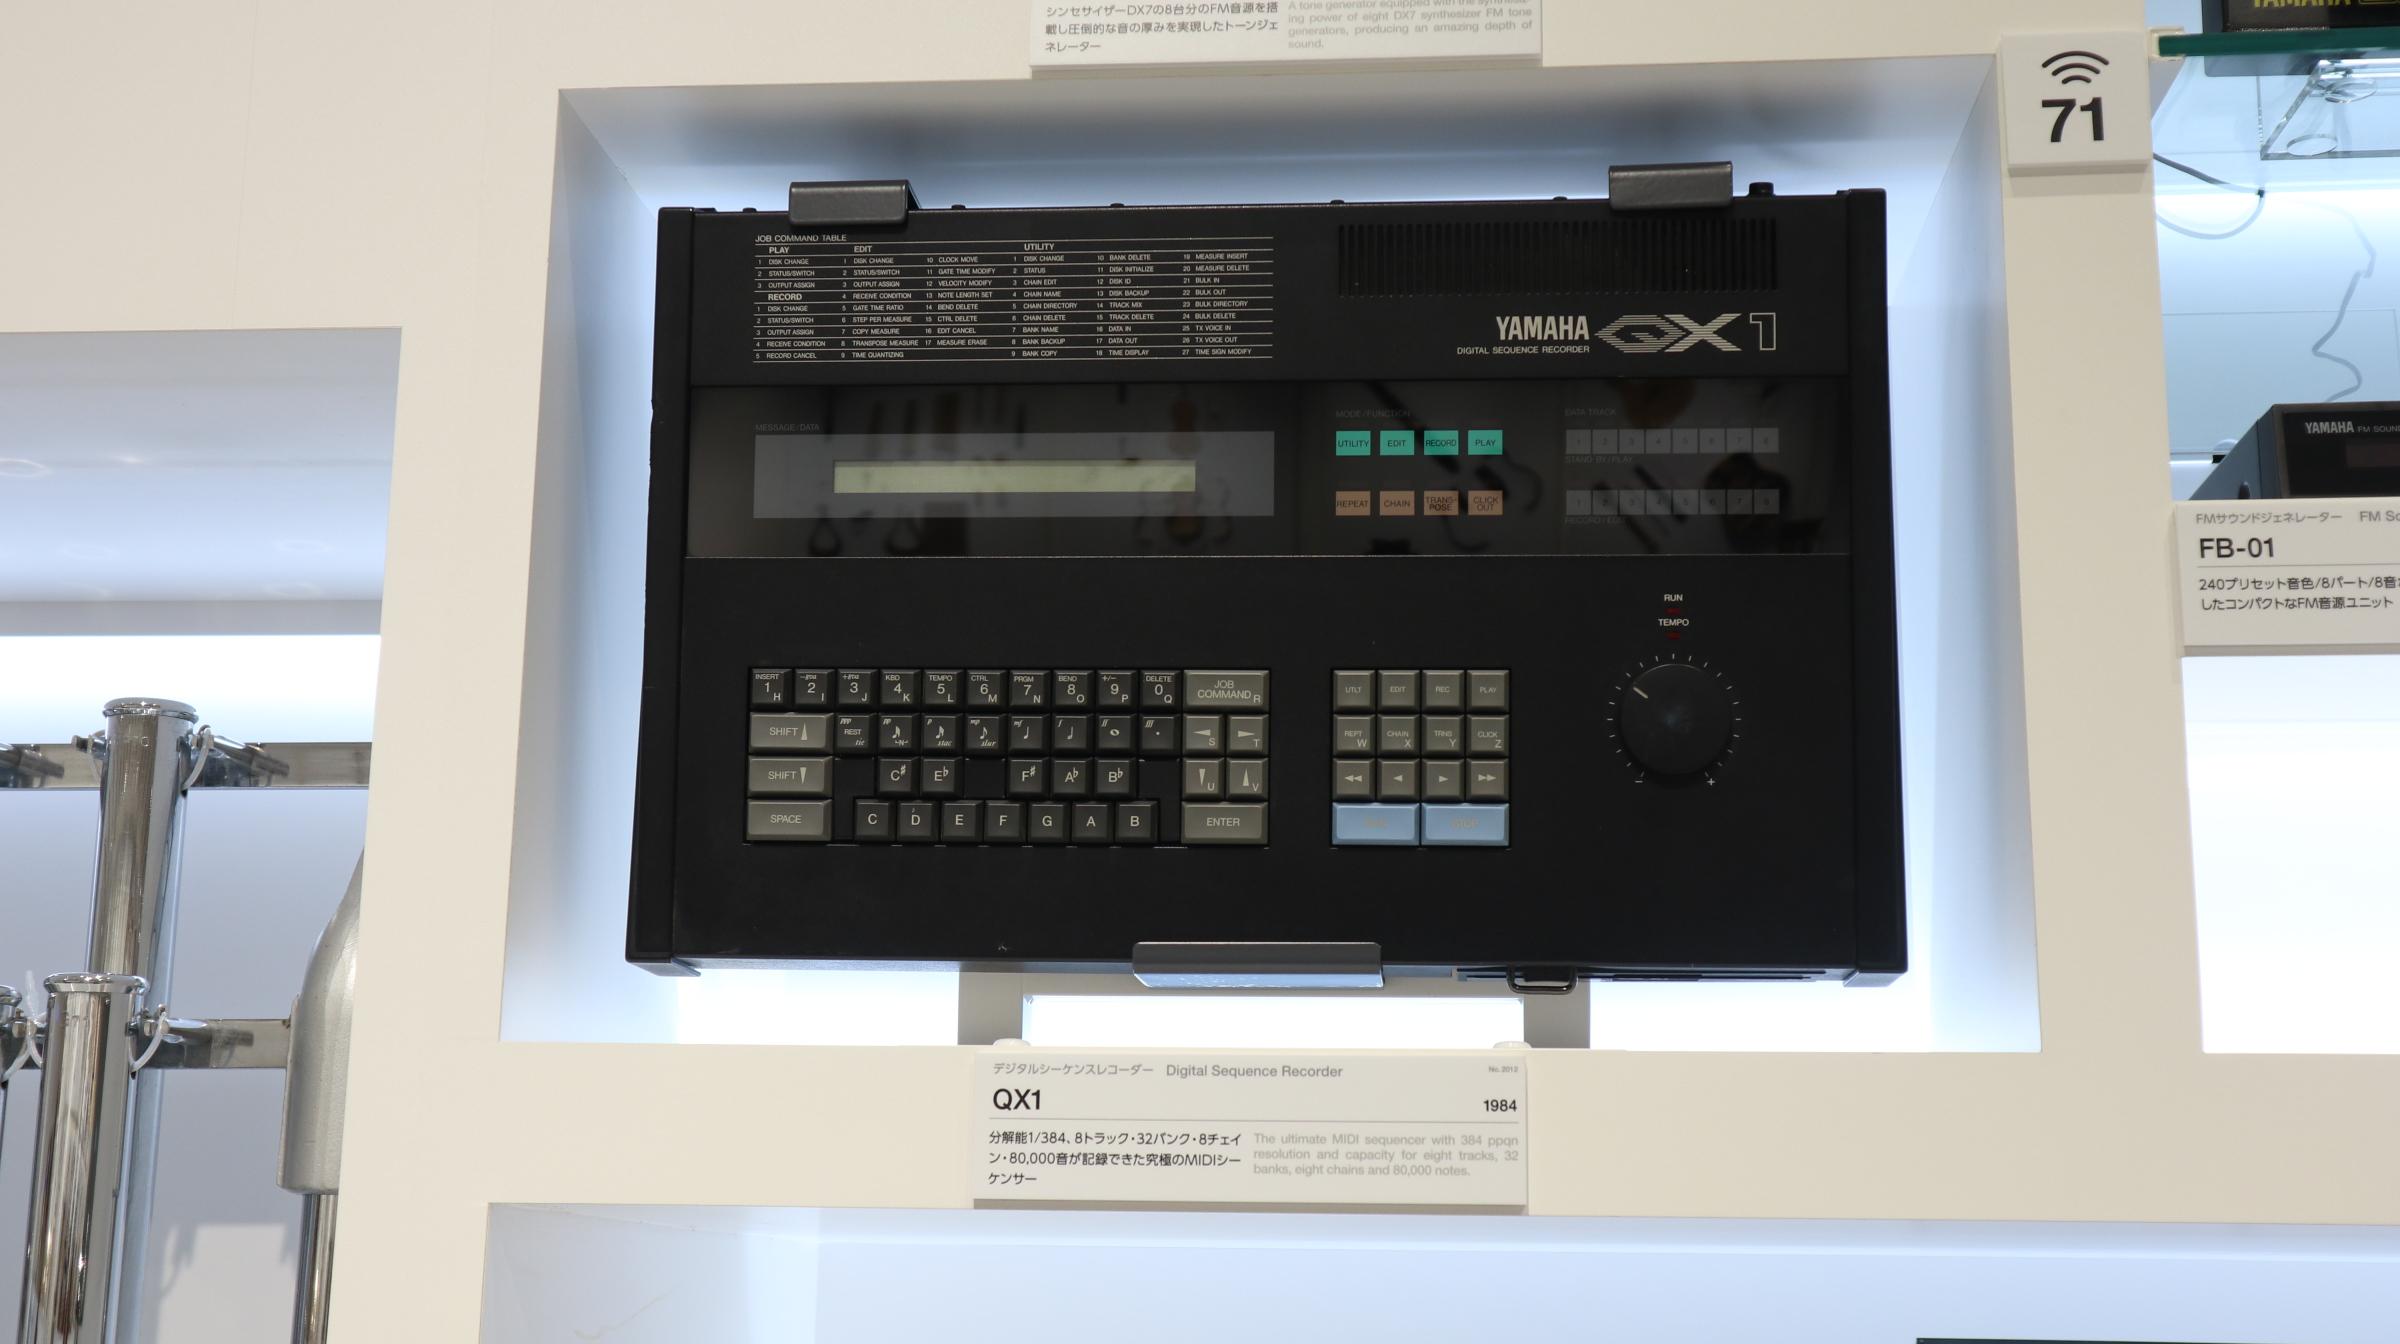 Yamaha QX1 sequencer